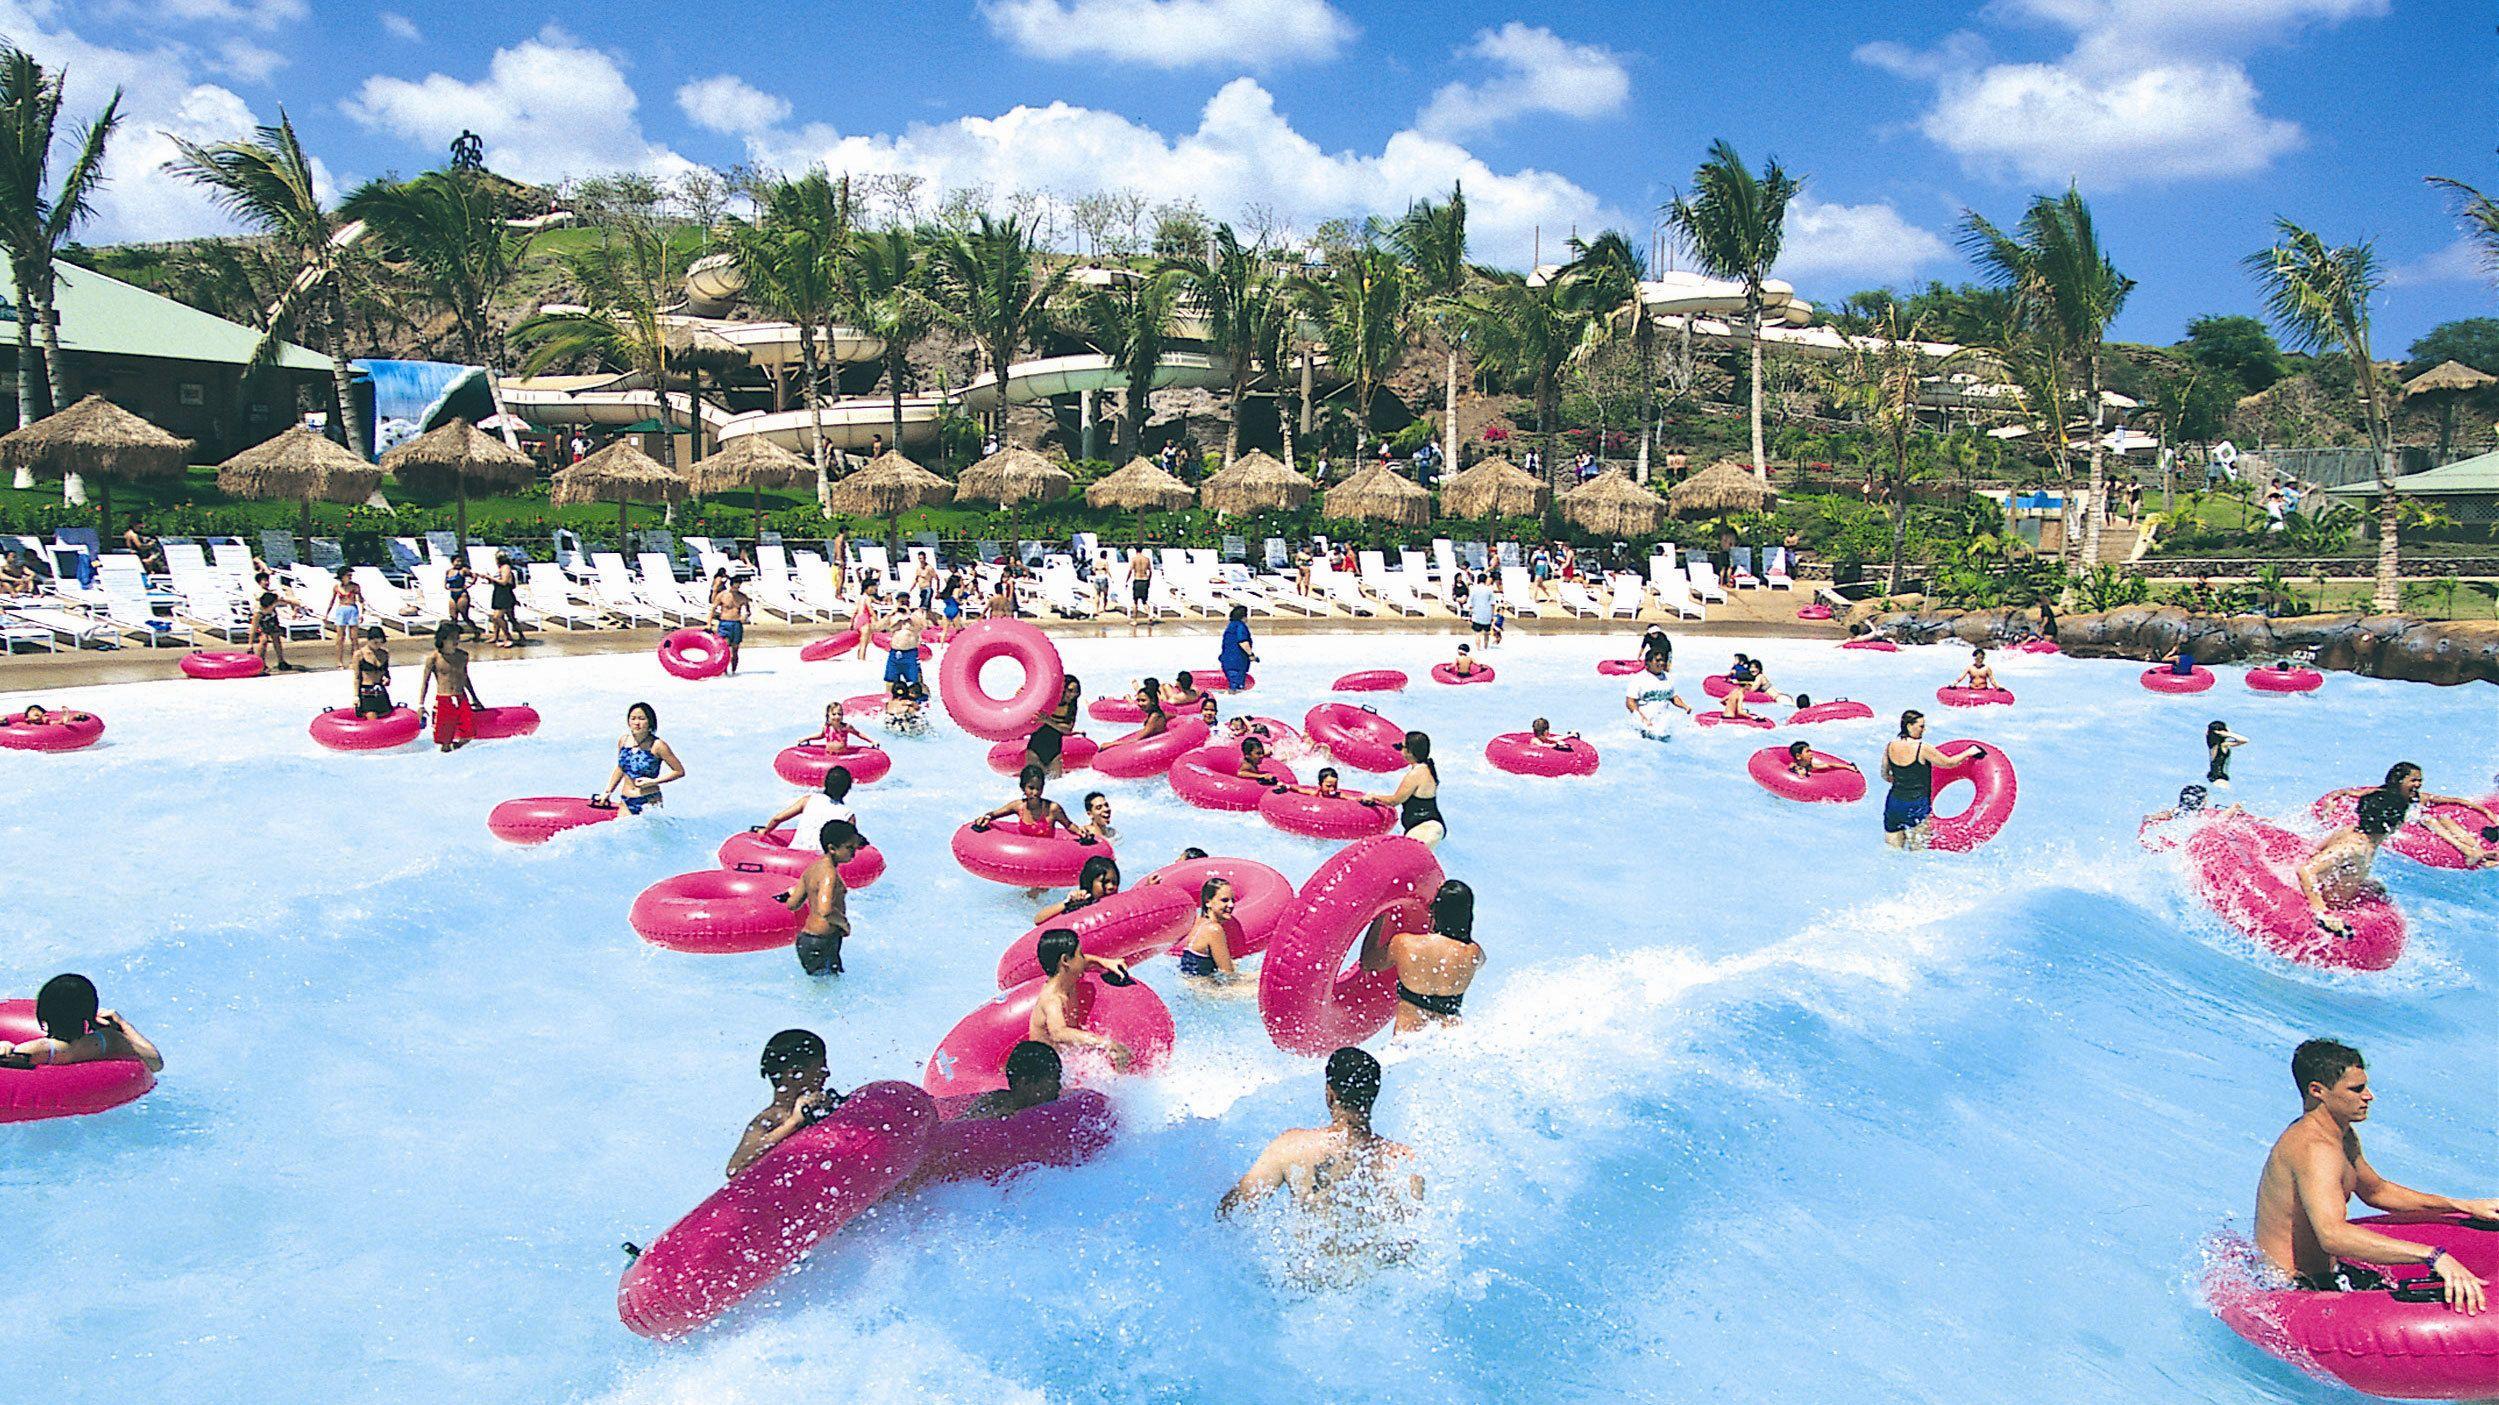 Wave pool at water park in Oahu